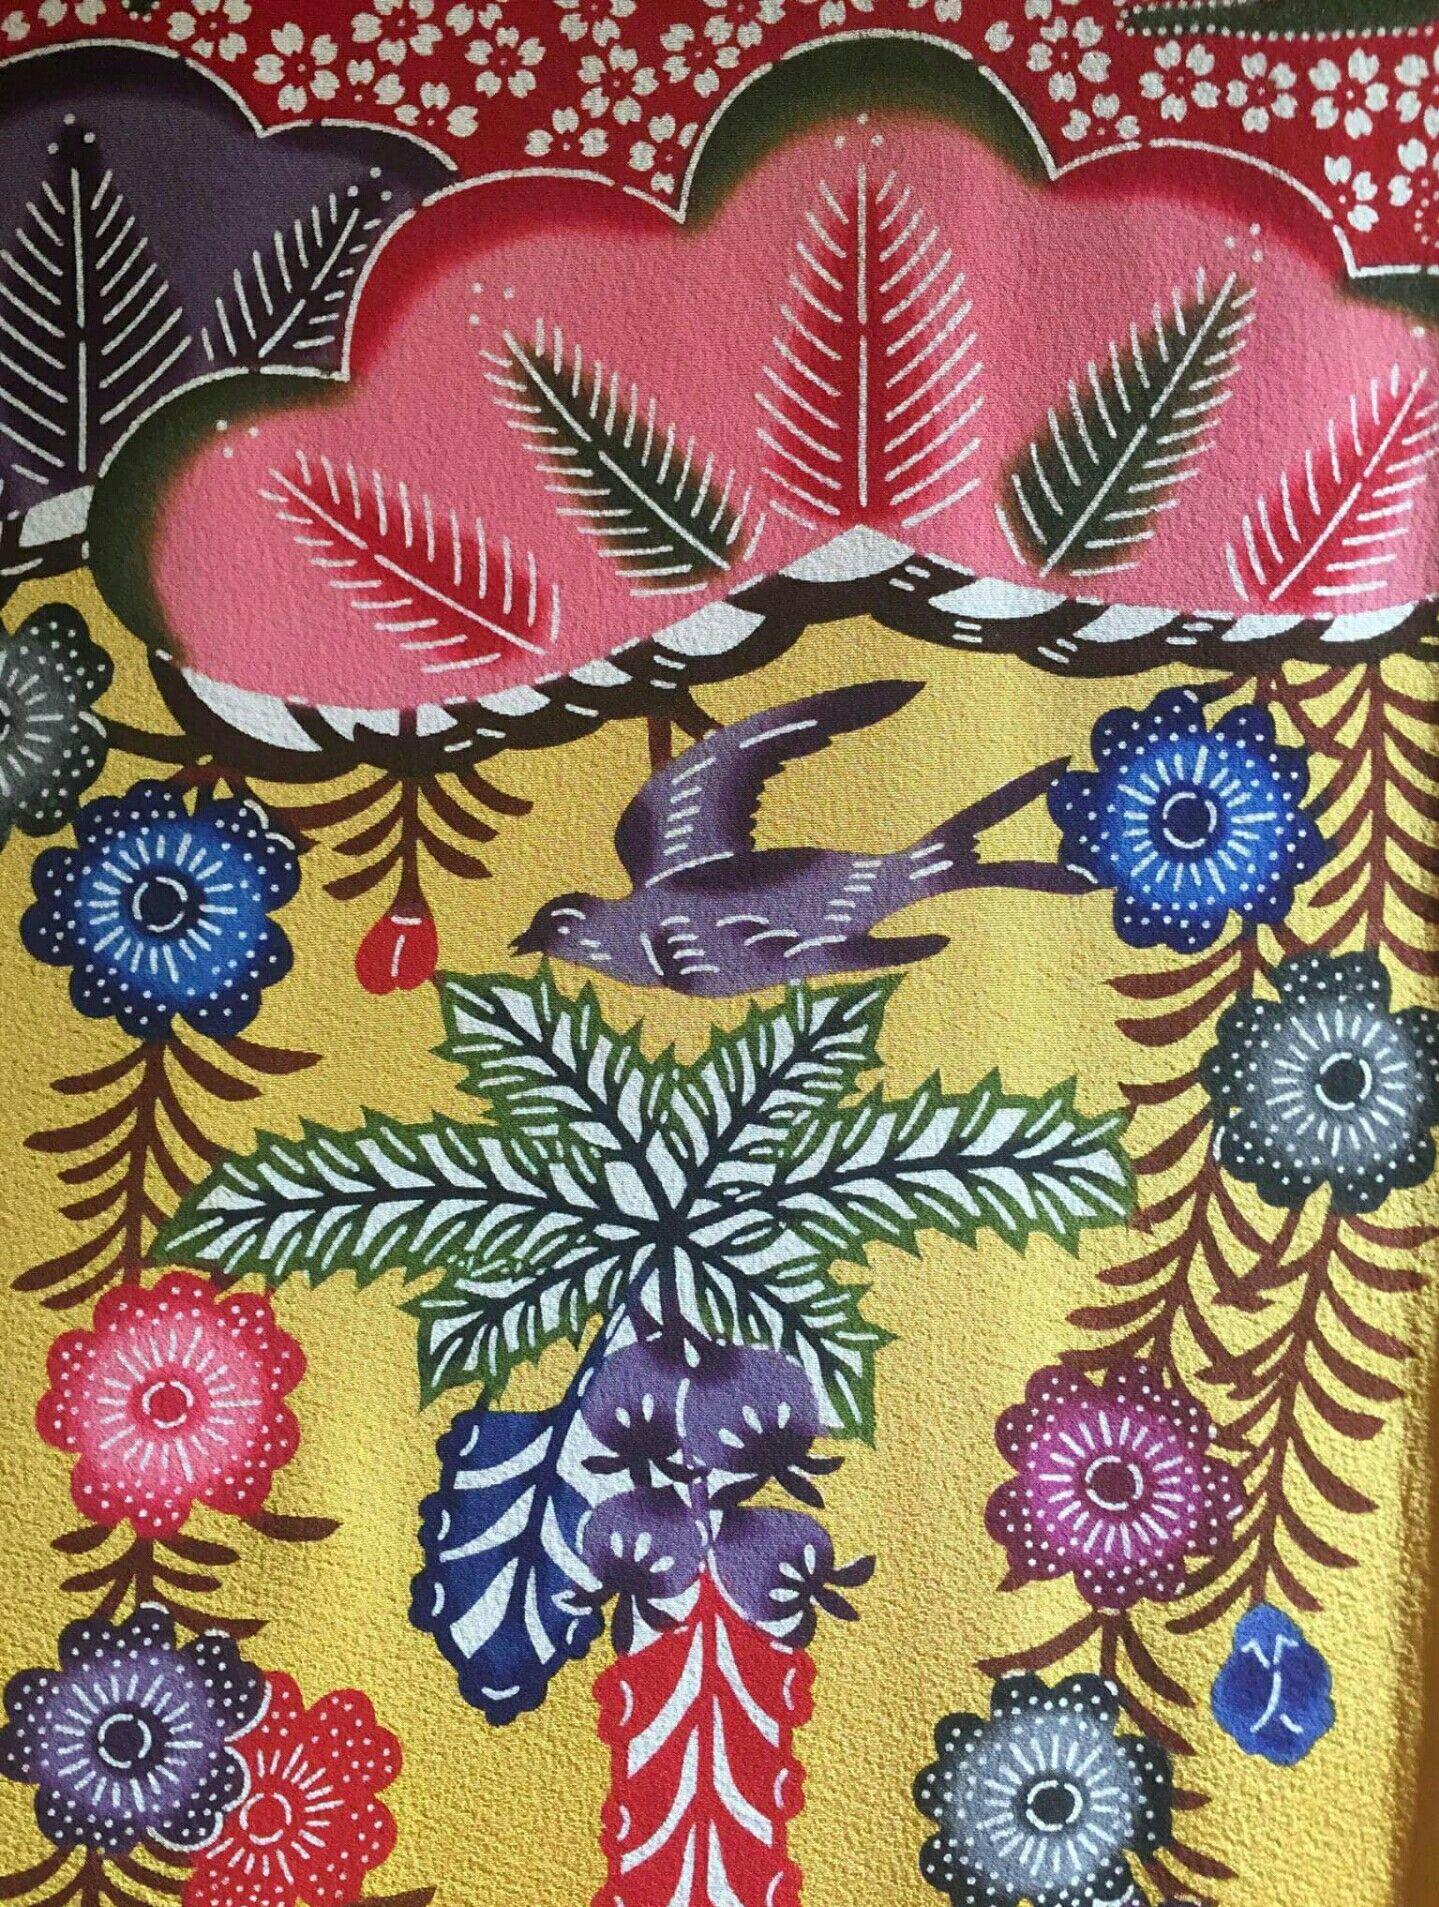 Bingata beauty! See the killer kimonos at Chelsea's Onishi Gallery this weekend. For more, tap into http://www.traditionalhome.com/design0/bingata-beauty Japan Society Japan Today Japan - The Government of Japan   All Nippon Airways Okinawa, Okinawa Asia Week New York Association Japanese Art Dealers Association #bingata #okinawa #textileart #nippon #resistdyeing #japan #design #interiors #makermovement #inspiration #handmade #art #craft #fashion